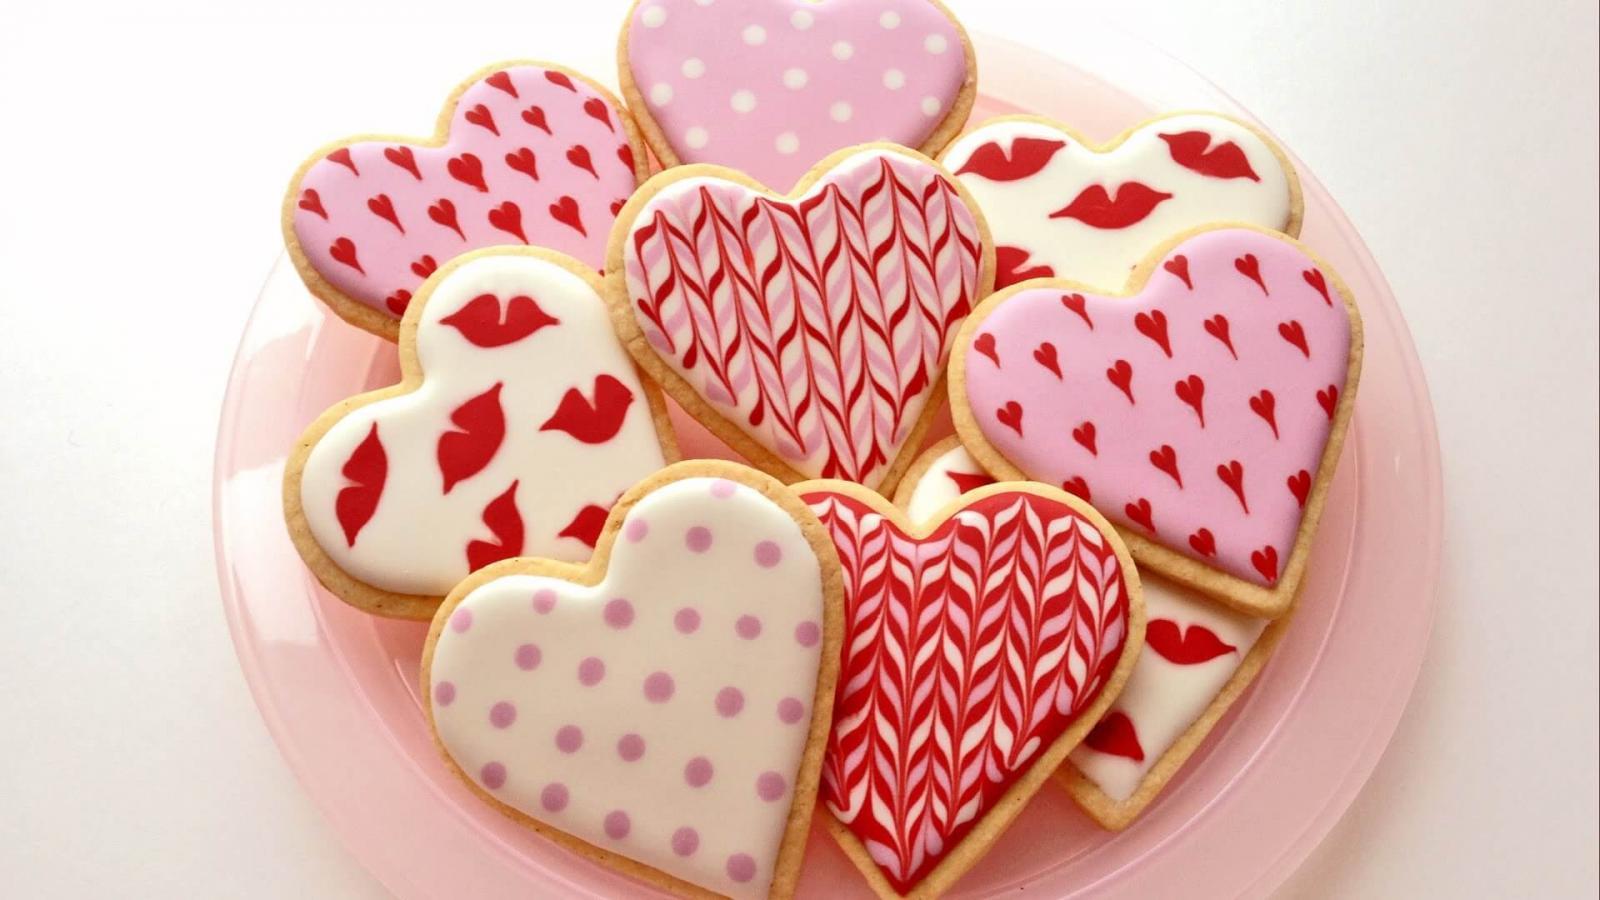 Мини-валентинки идеи на 14 февраля